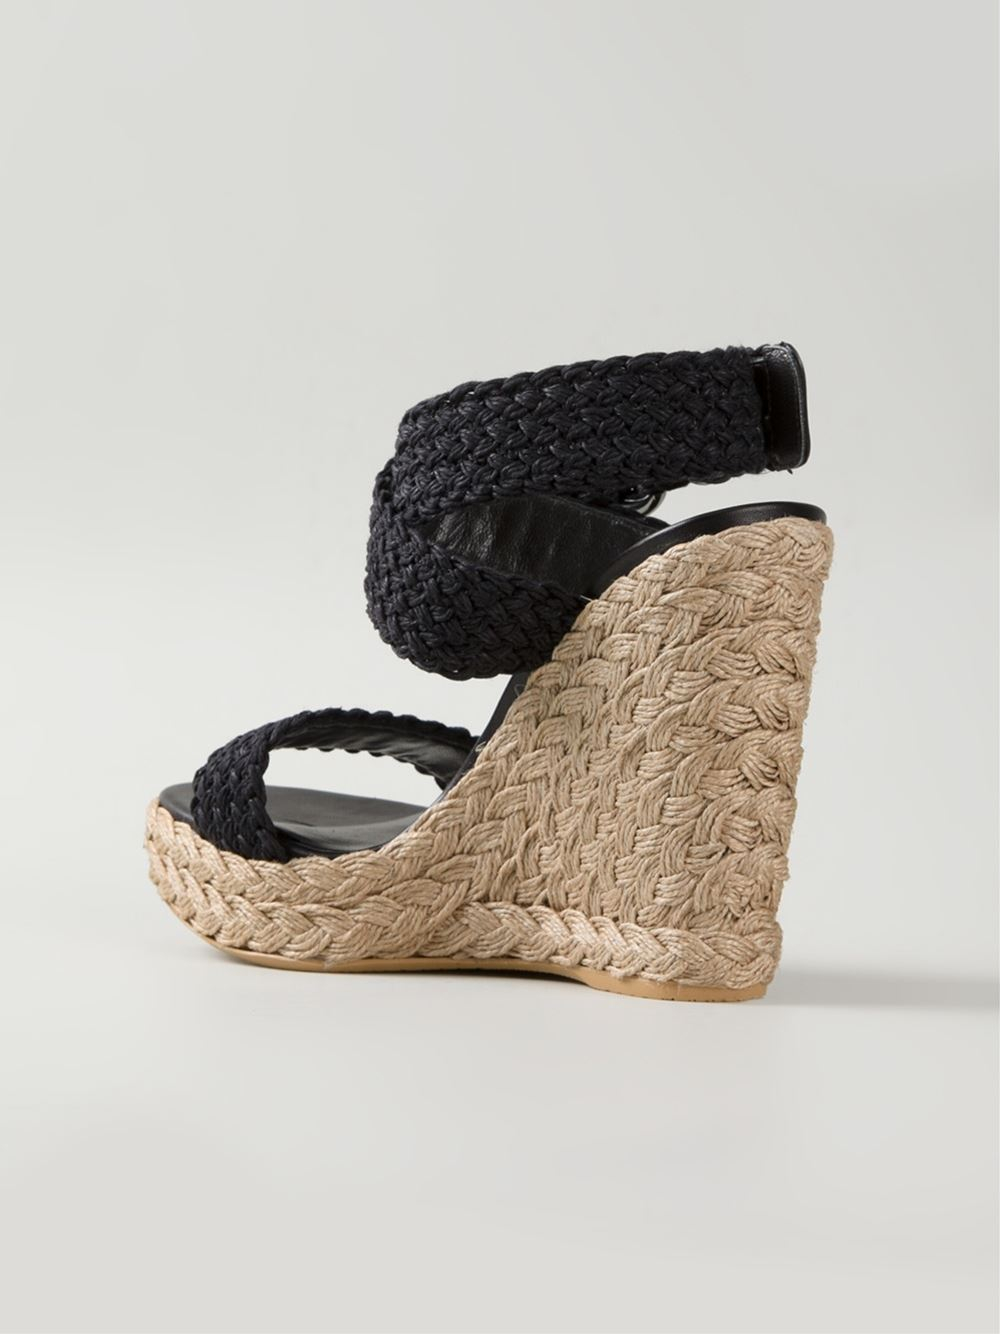 Lyst Stuart Weitzman Woven Wedge Sandals In Black